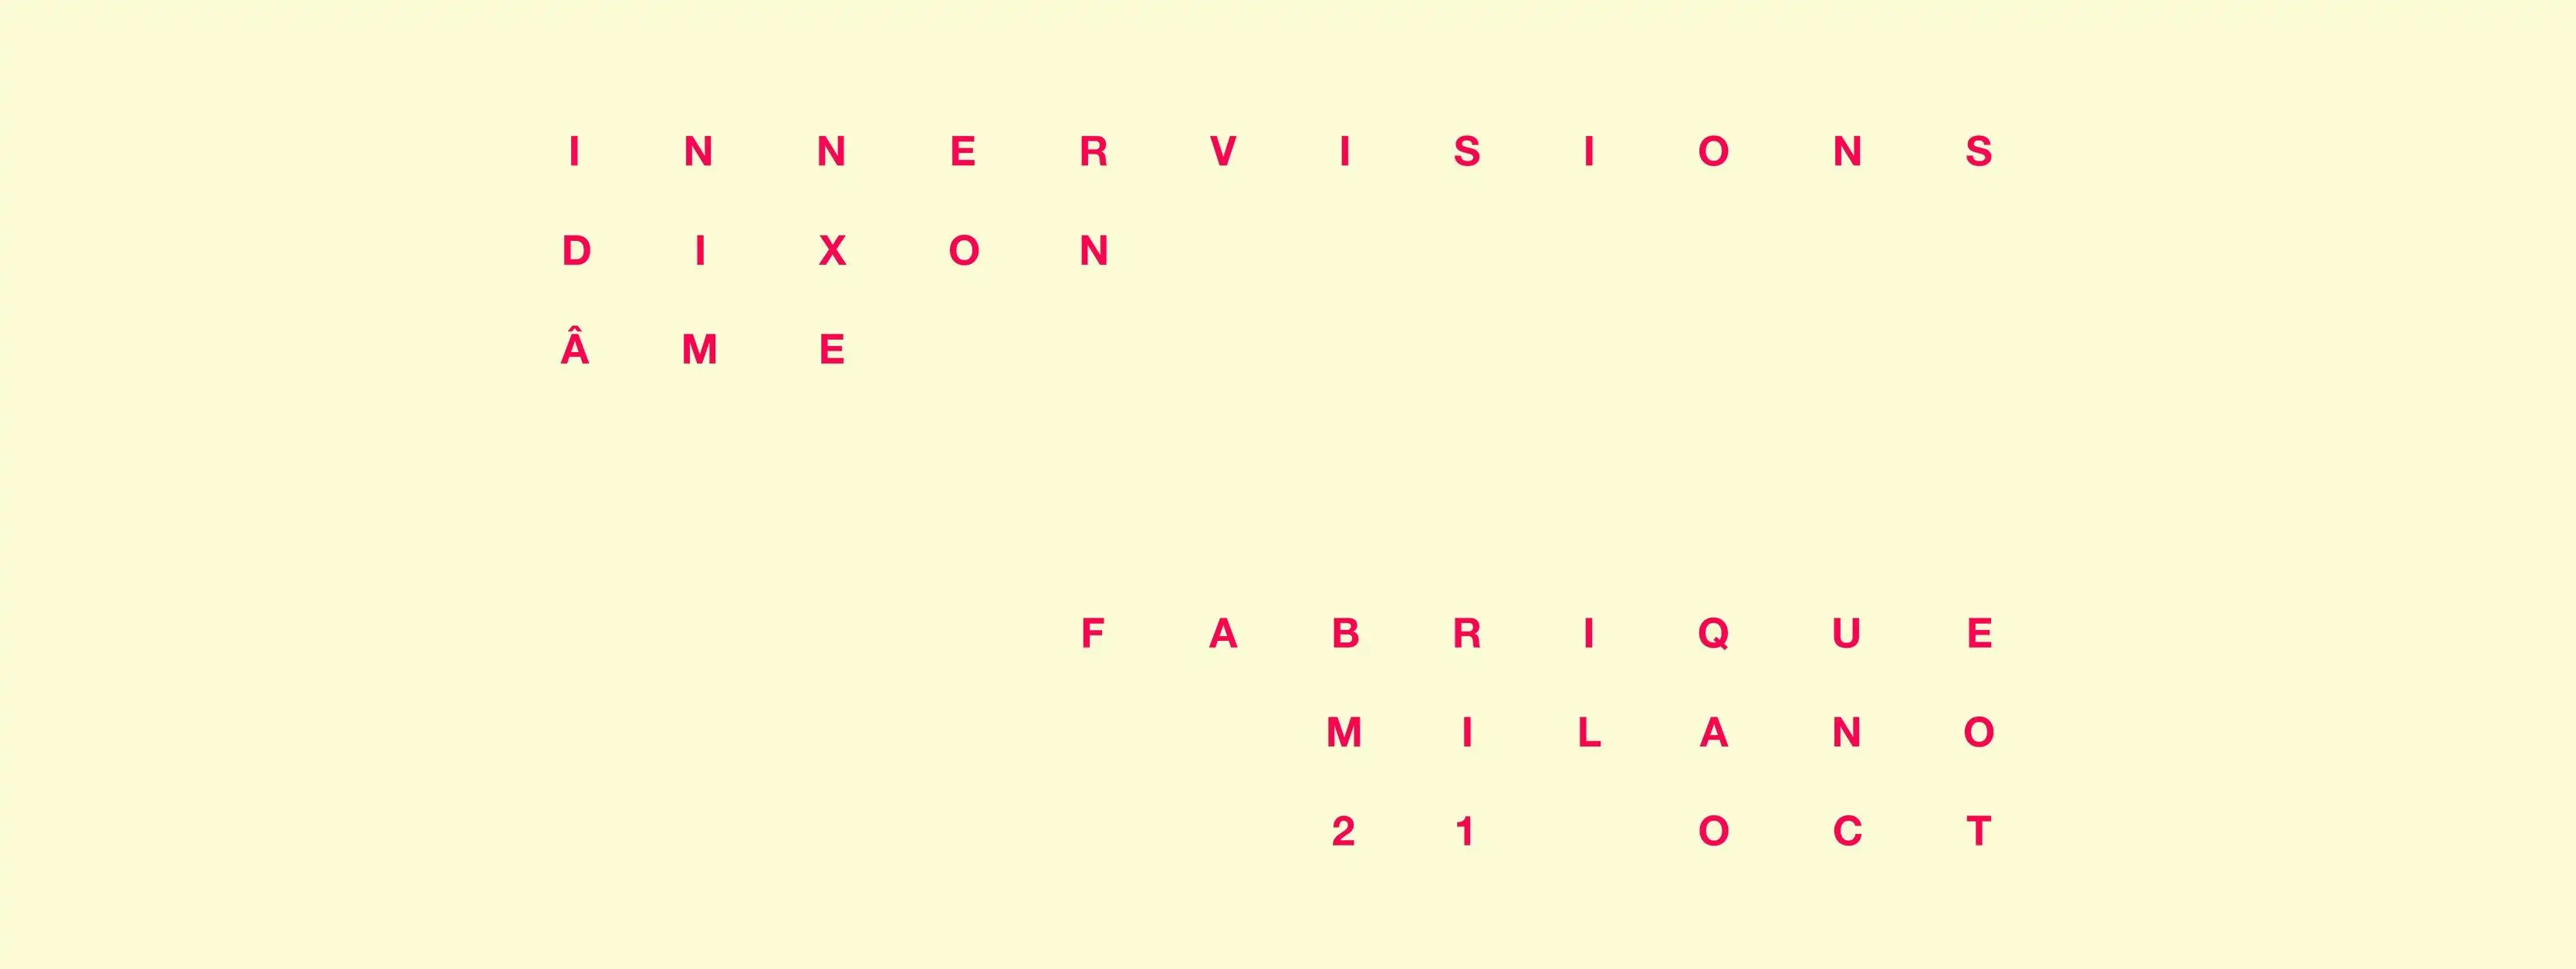 VENERDì 21 10 2016 FABRIQUE MILANO INNERVISION (ÅME + DIXON)